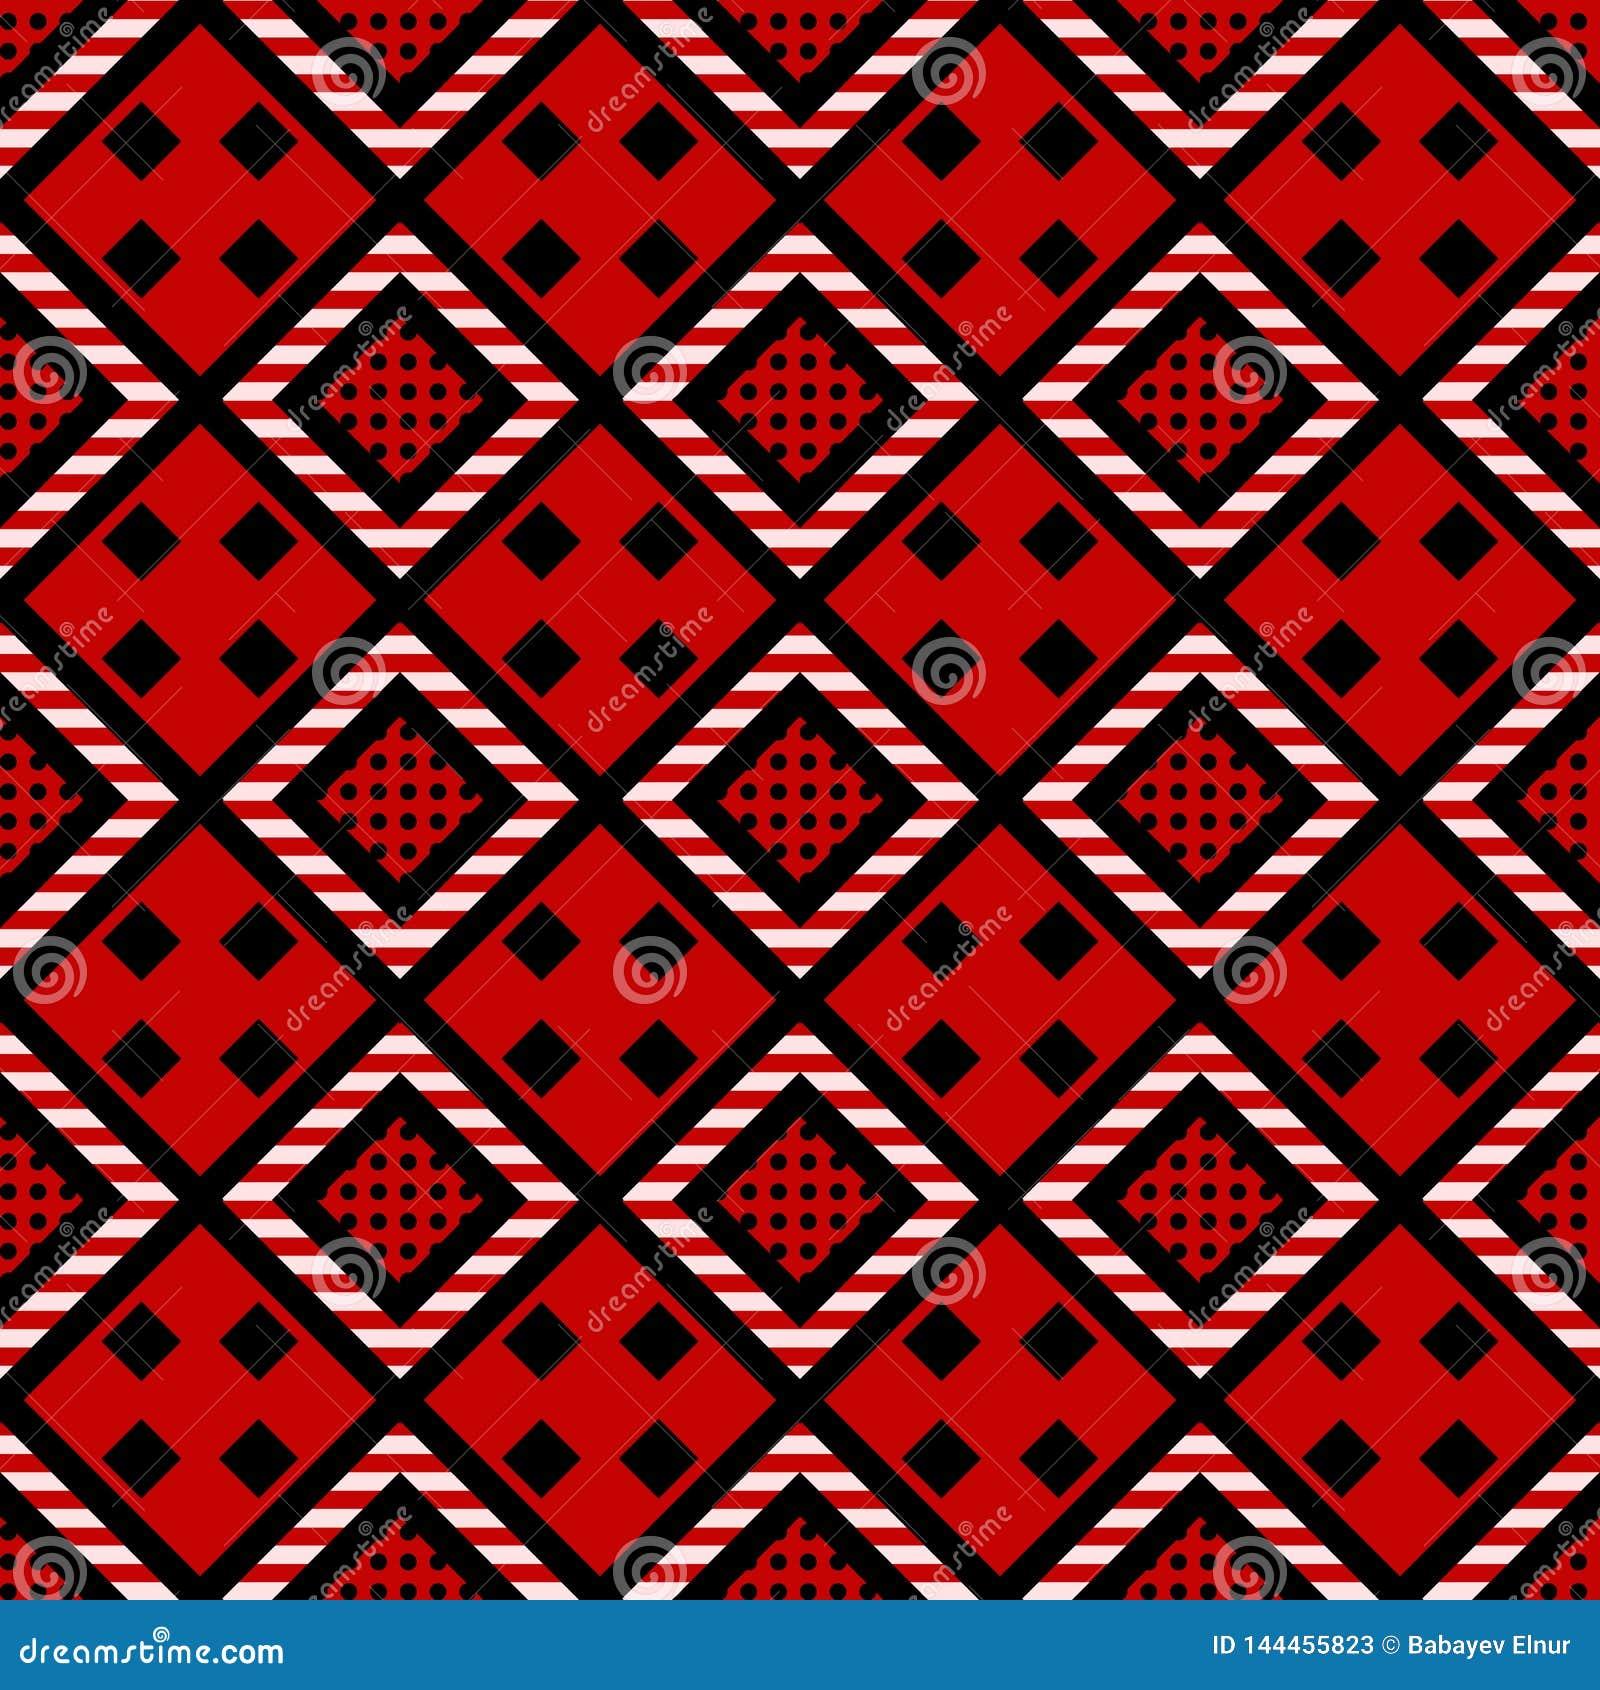 R Textura tribal abstracta Rhombus negro, blanco en fondo decorativo rojo